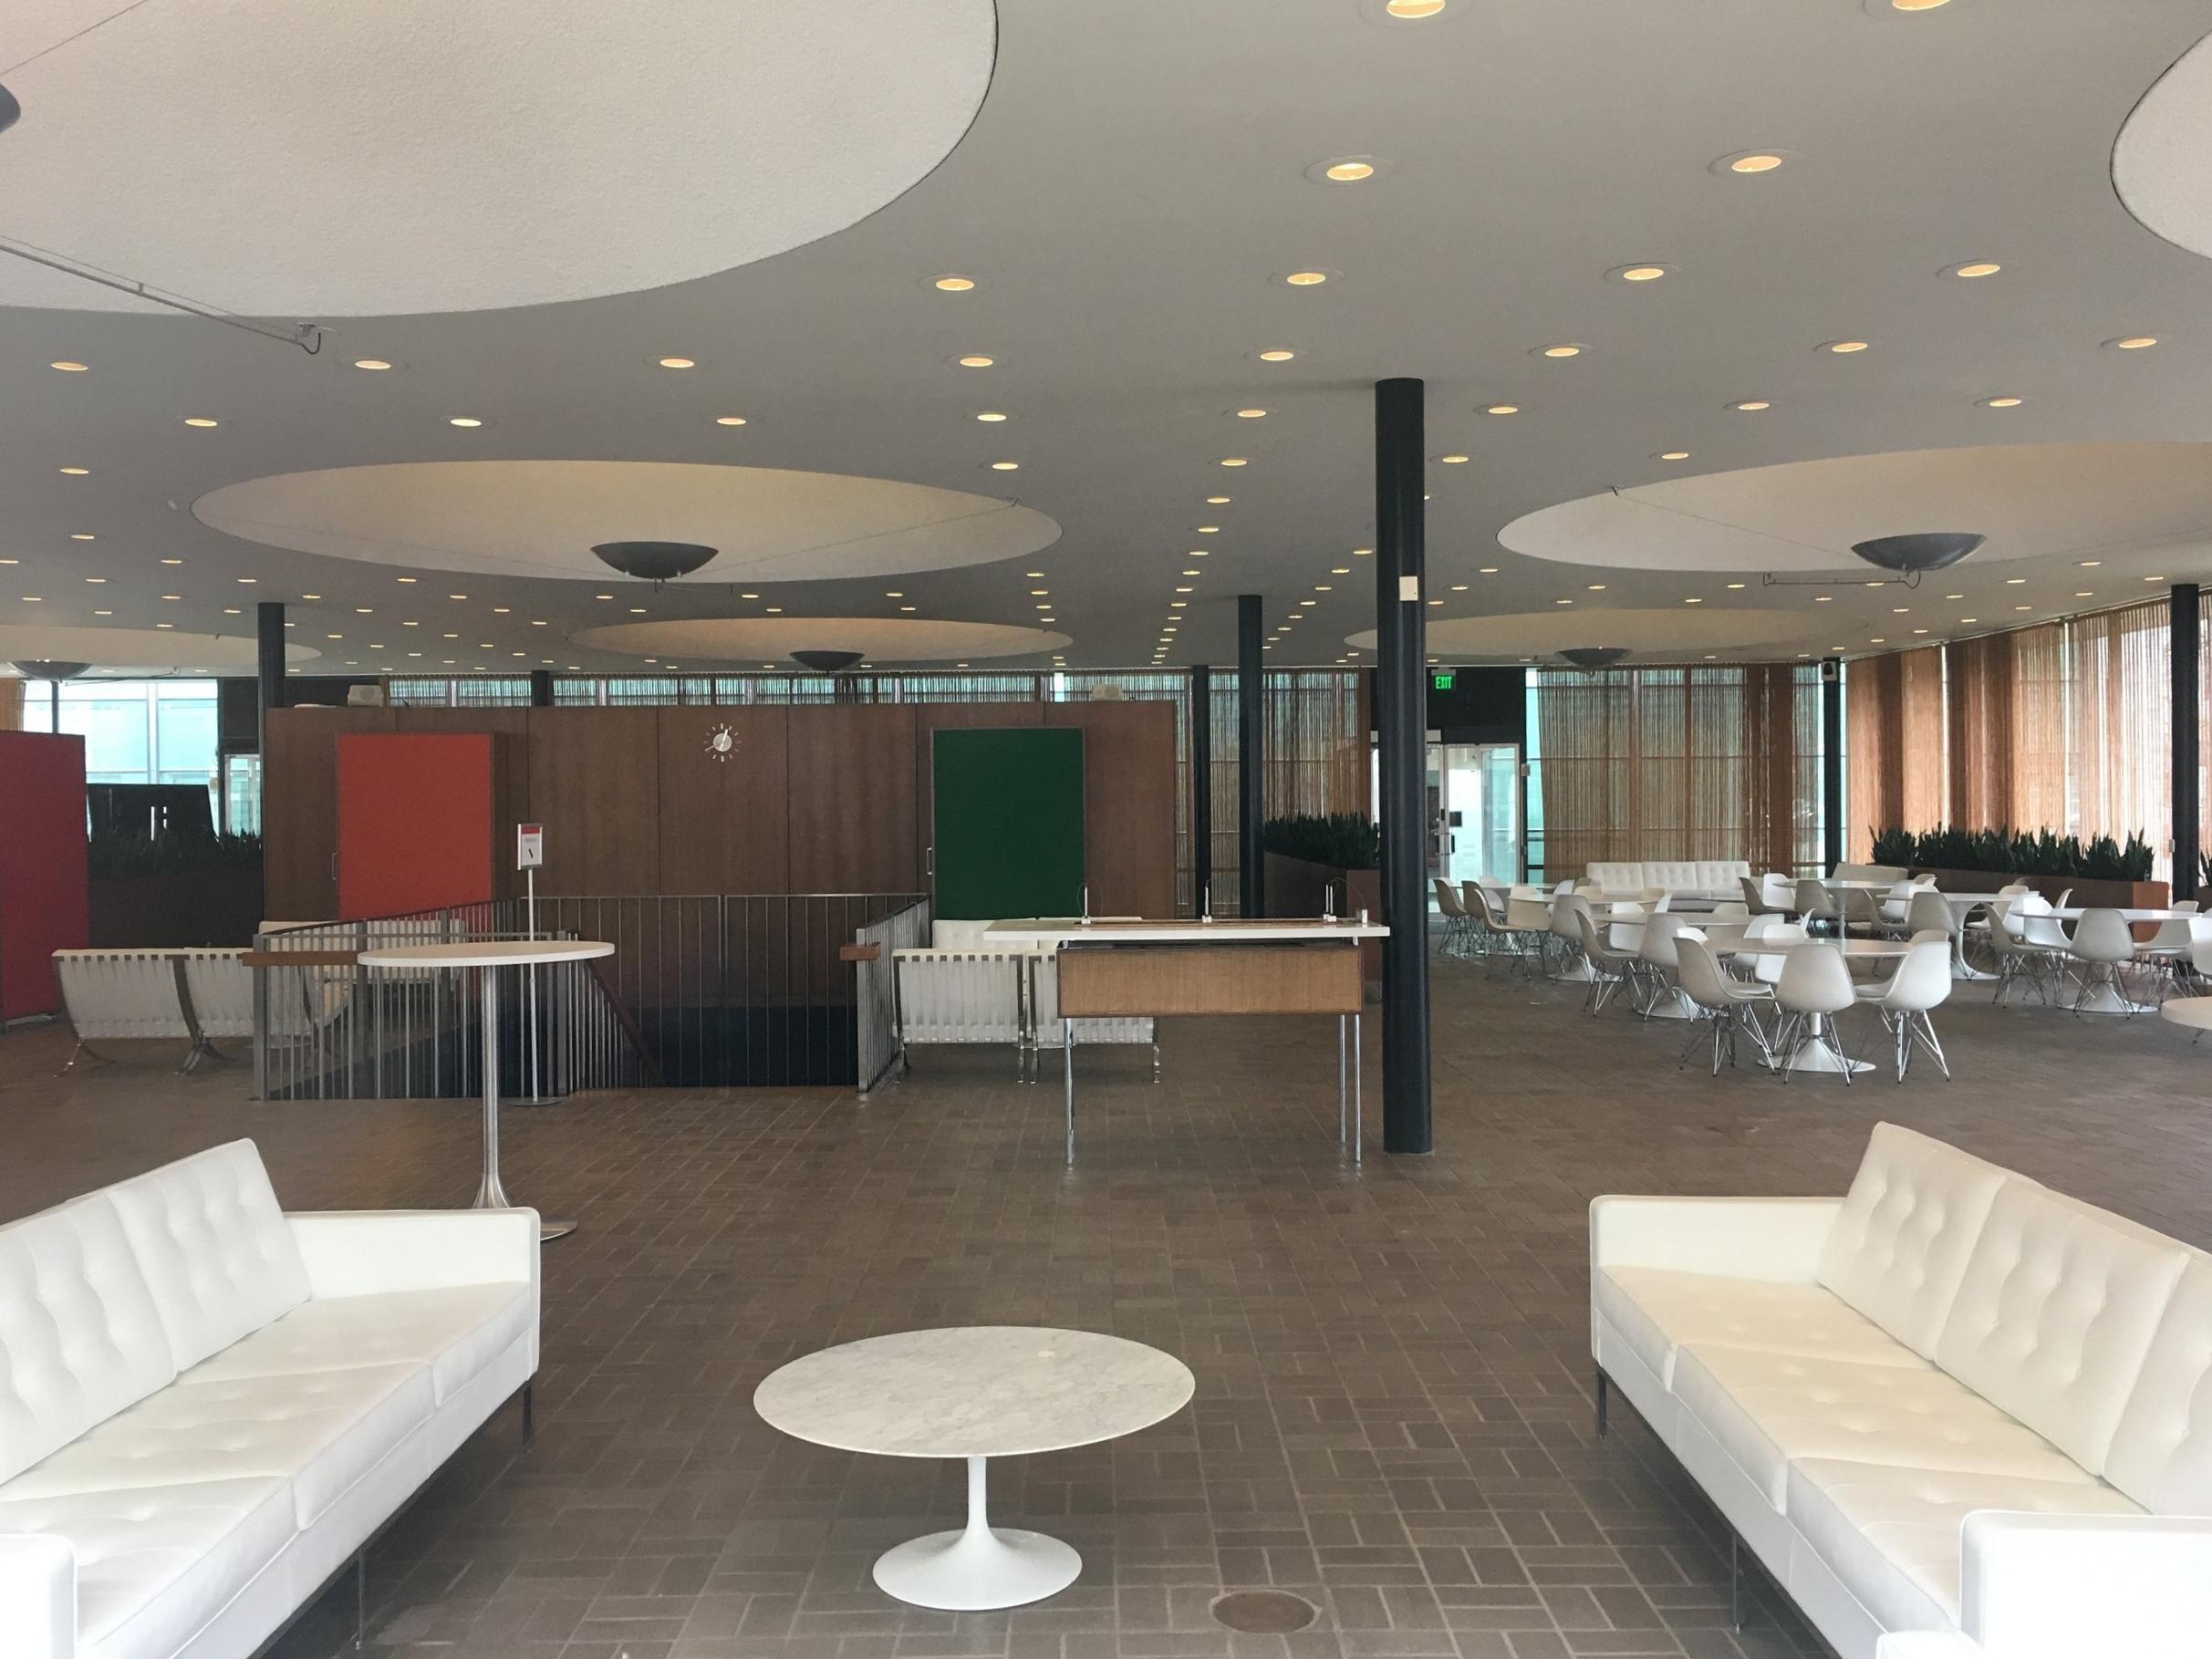 Eero Saarinen's Irwin Union Bank interior